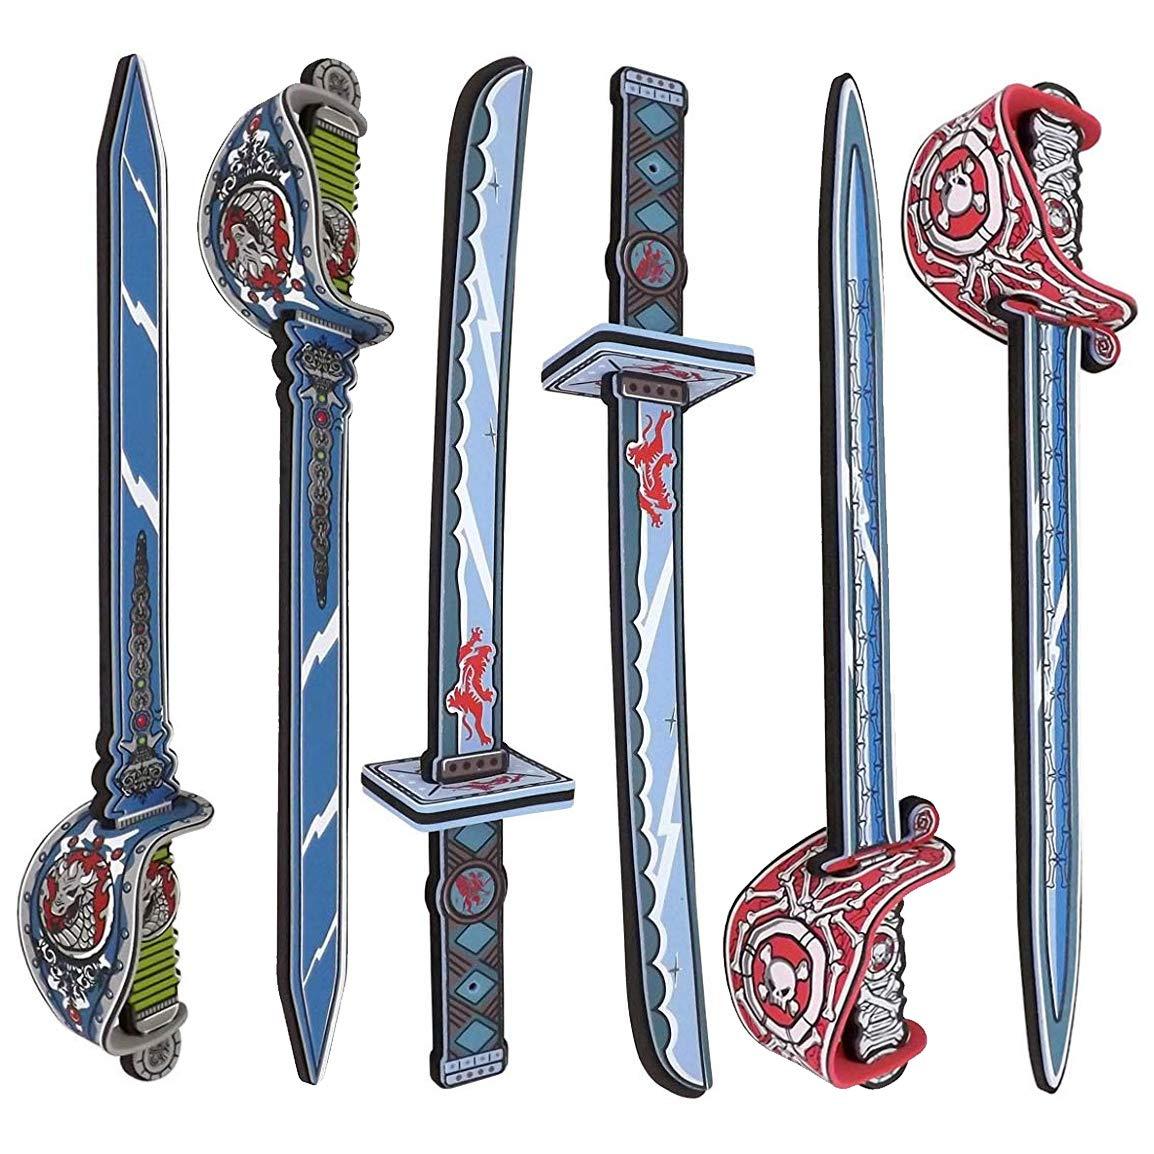 Liberty Imports Samurai Warrior and Pirate Foam Swords 6 Pack Large Toy Set  for Kids - 2 Katanas 4 Rapiers